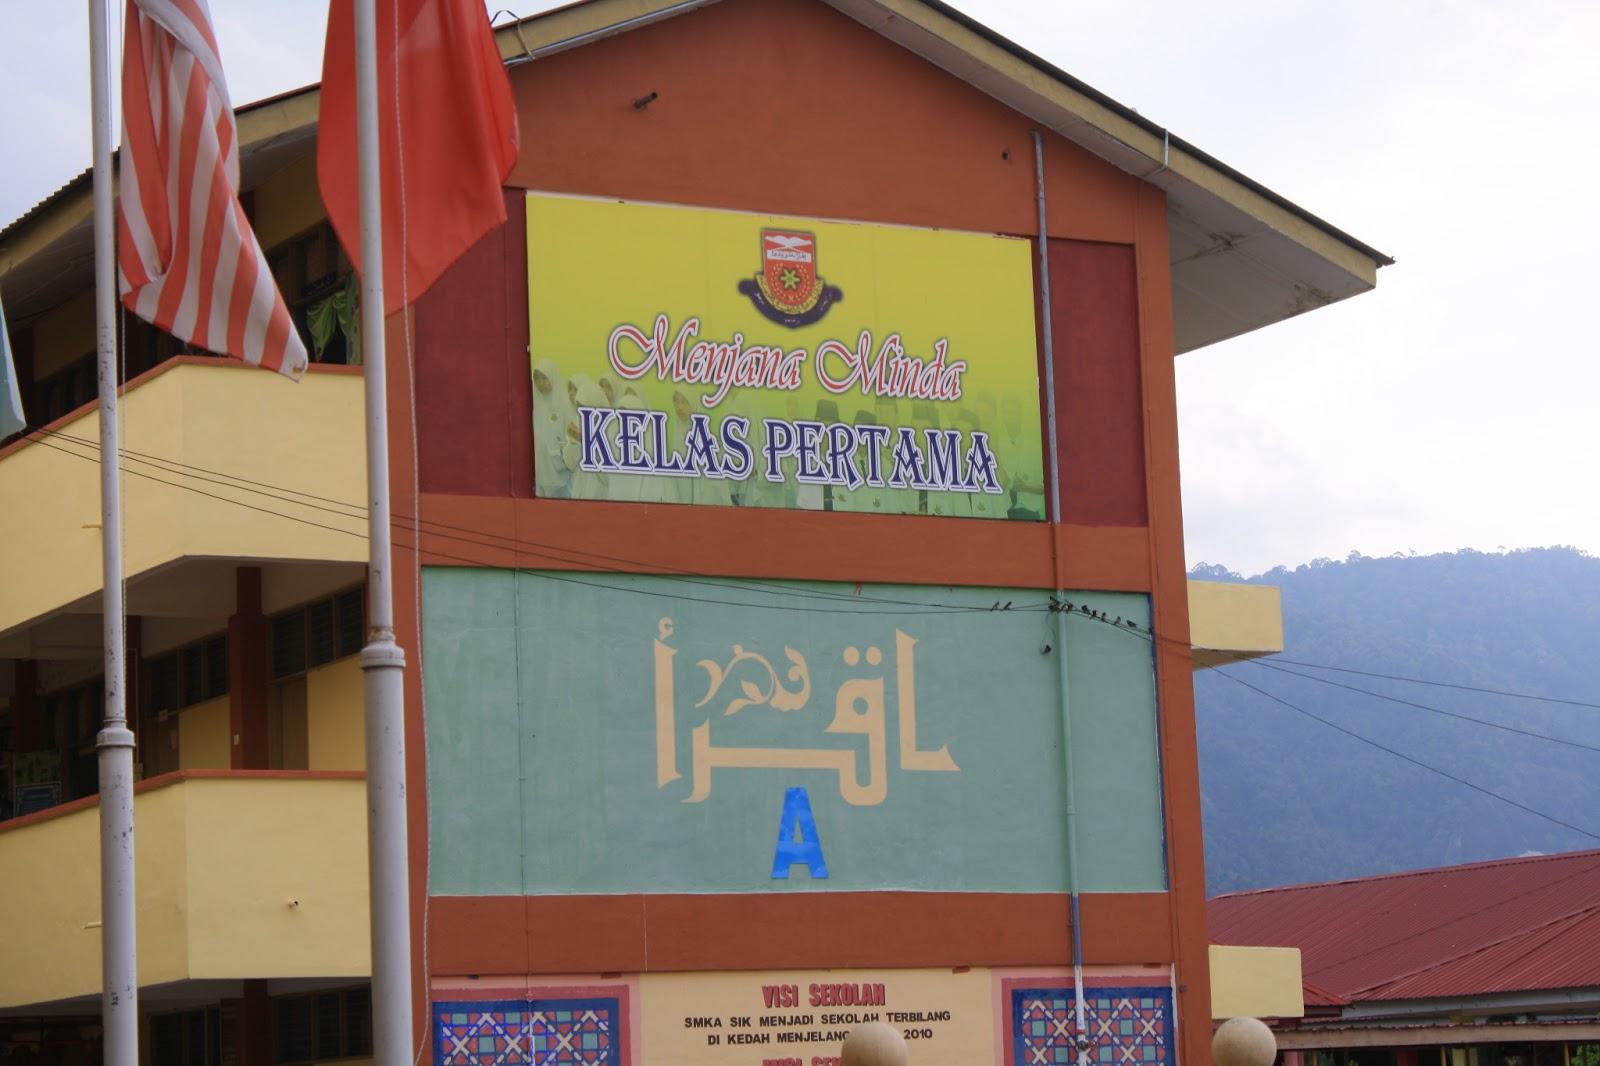 Pejabat Tapak Sekolah Menengah Kebangsaan Agama Jerlun Pusat Siswa